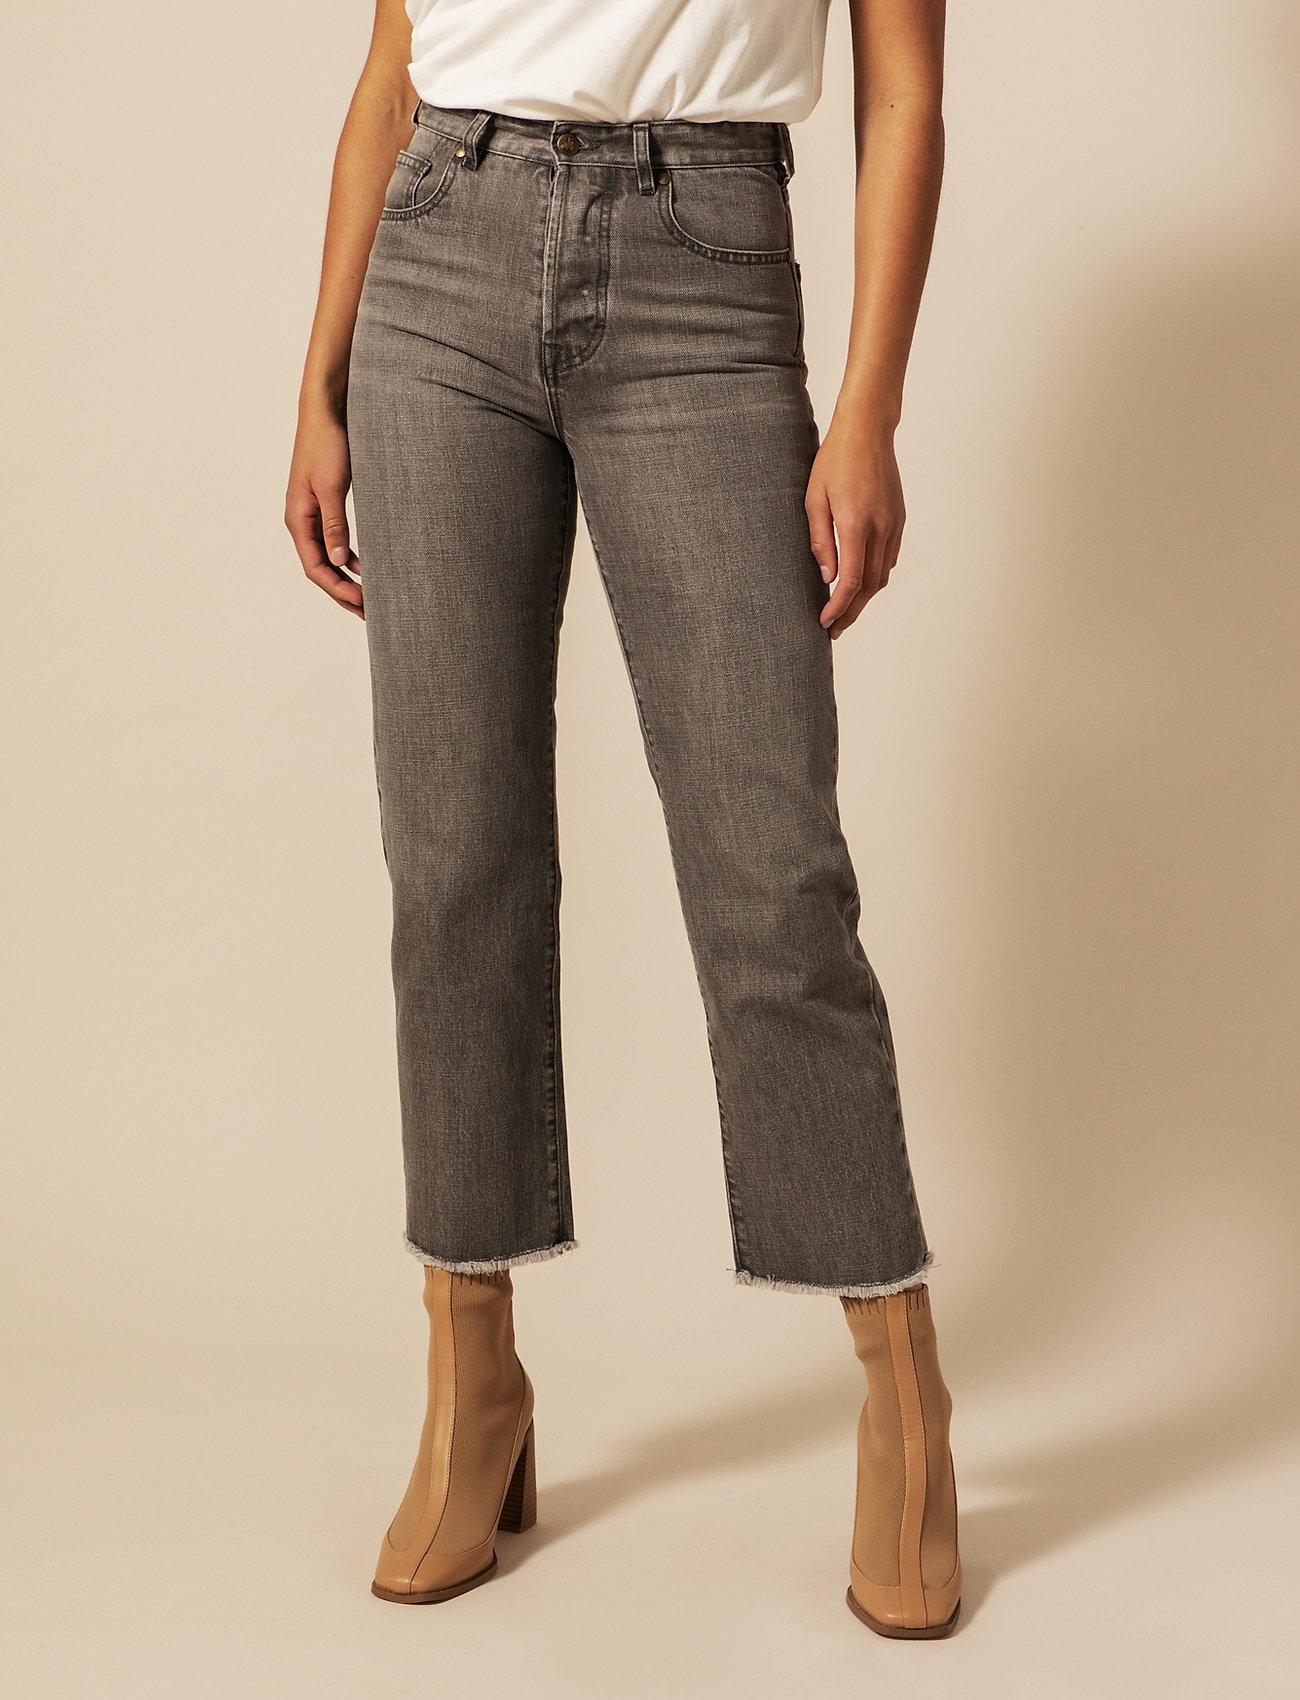 By Malina - Alexa jeans - straight regular - washed grey - 0